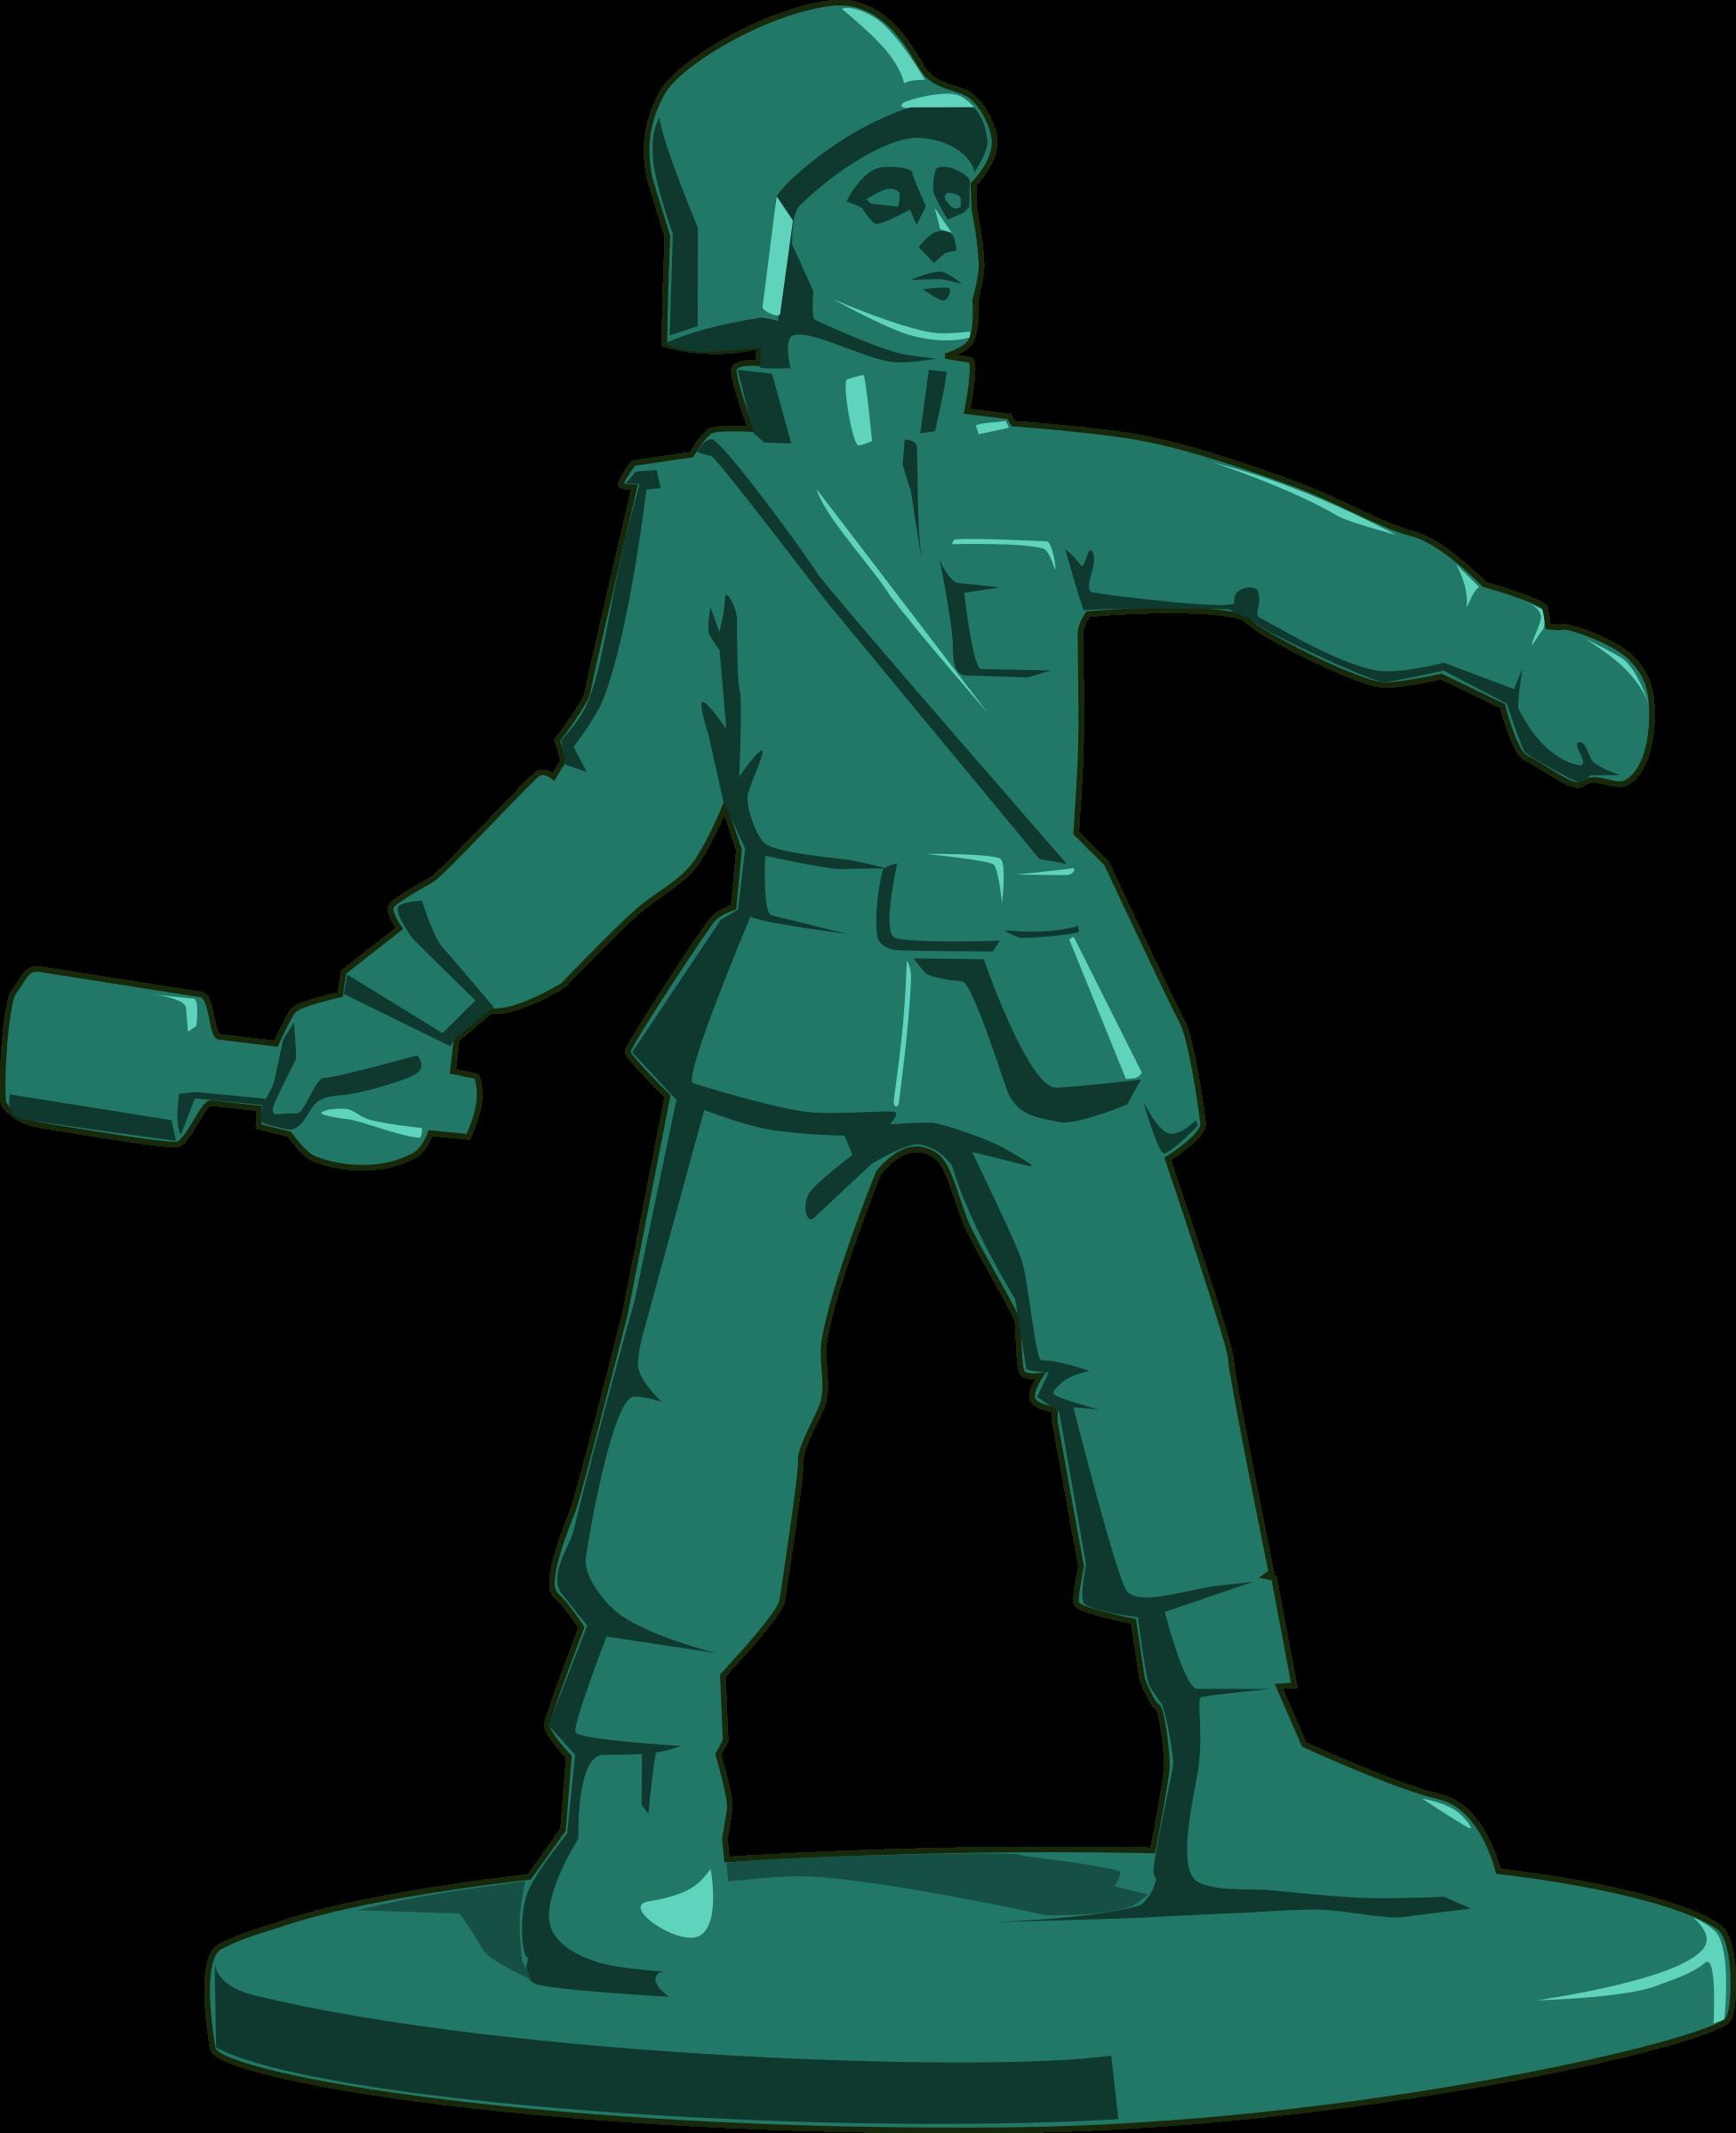 Soldier clipart toy soldier Toy soldier Clipart soldier toy